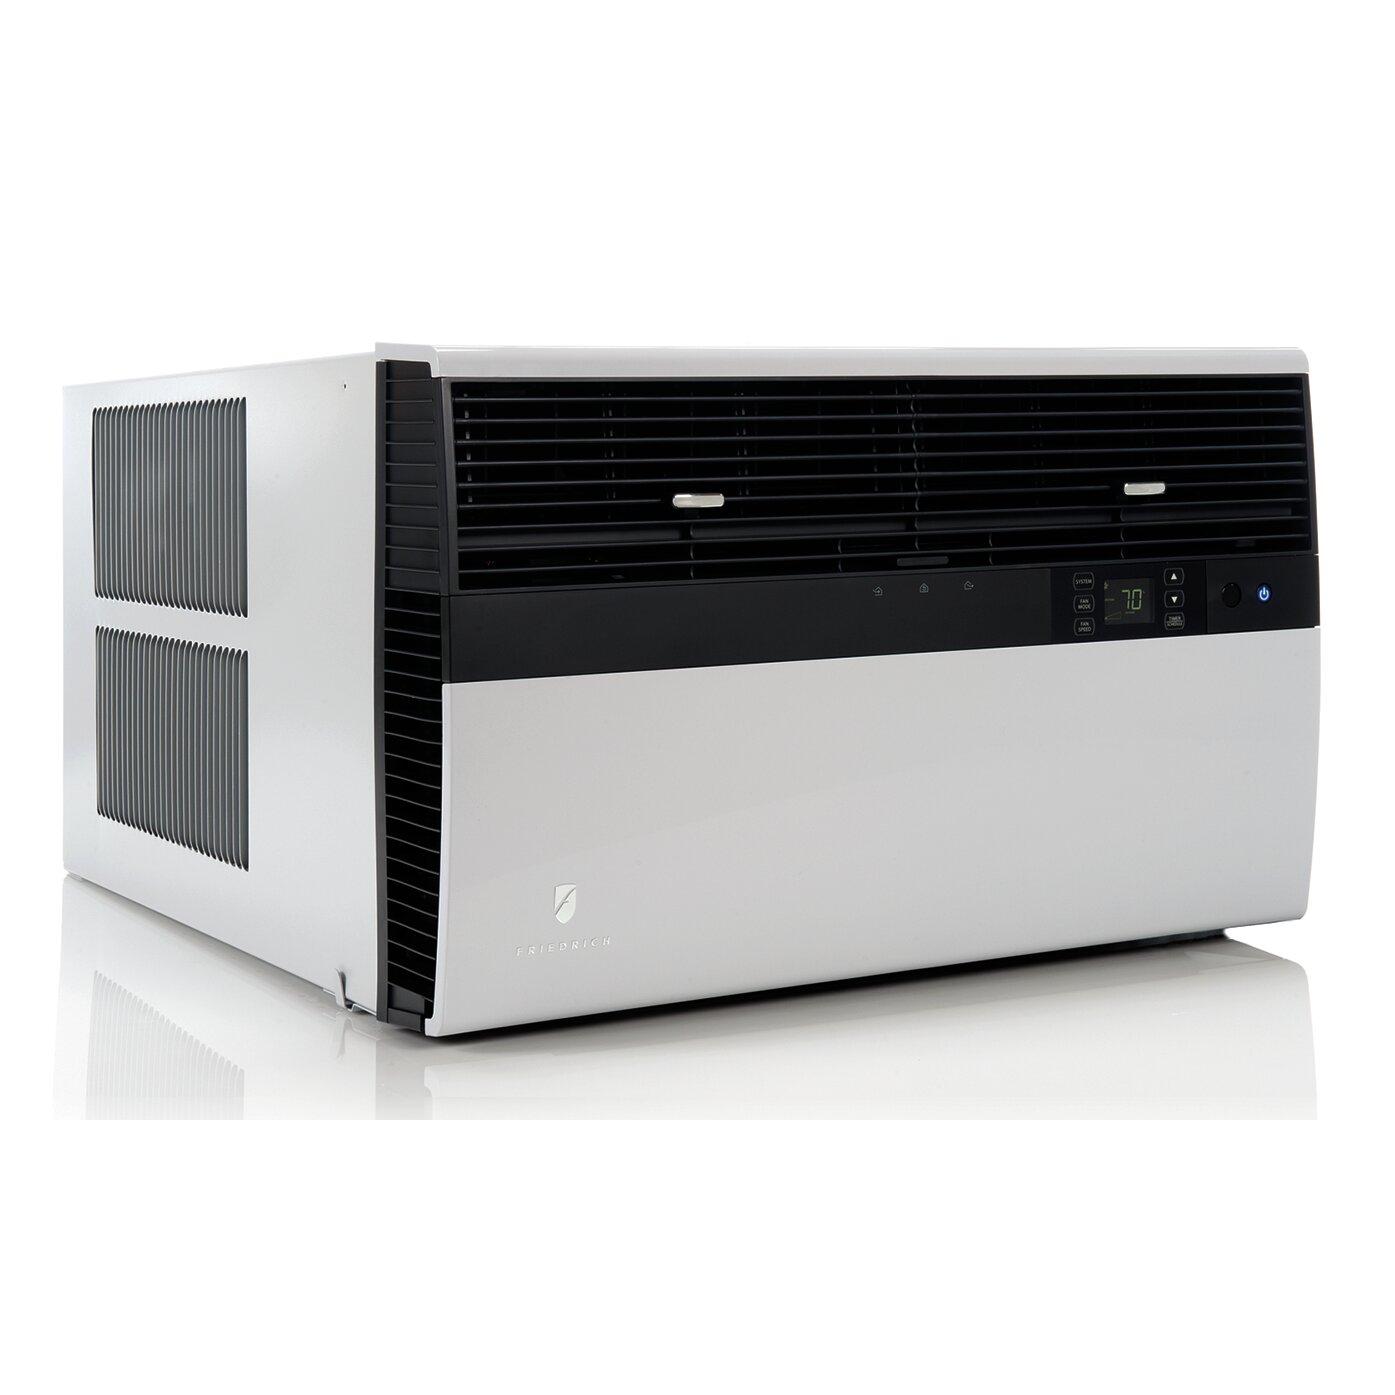 24000 BTU Energy Star Window Air Conditioner with Remote by Friedrich #576374